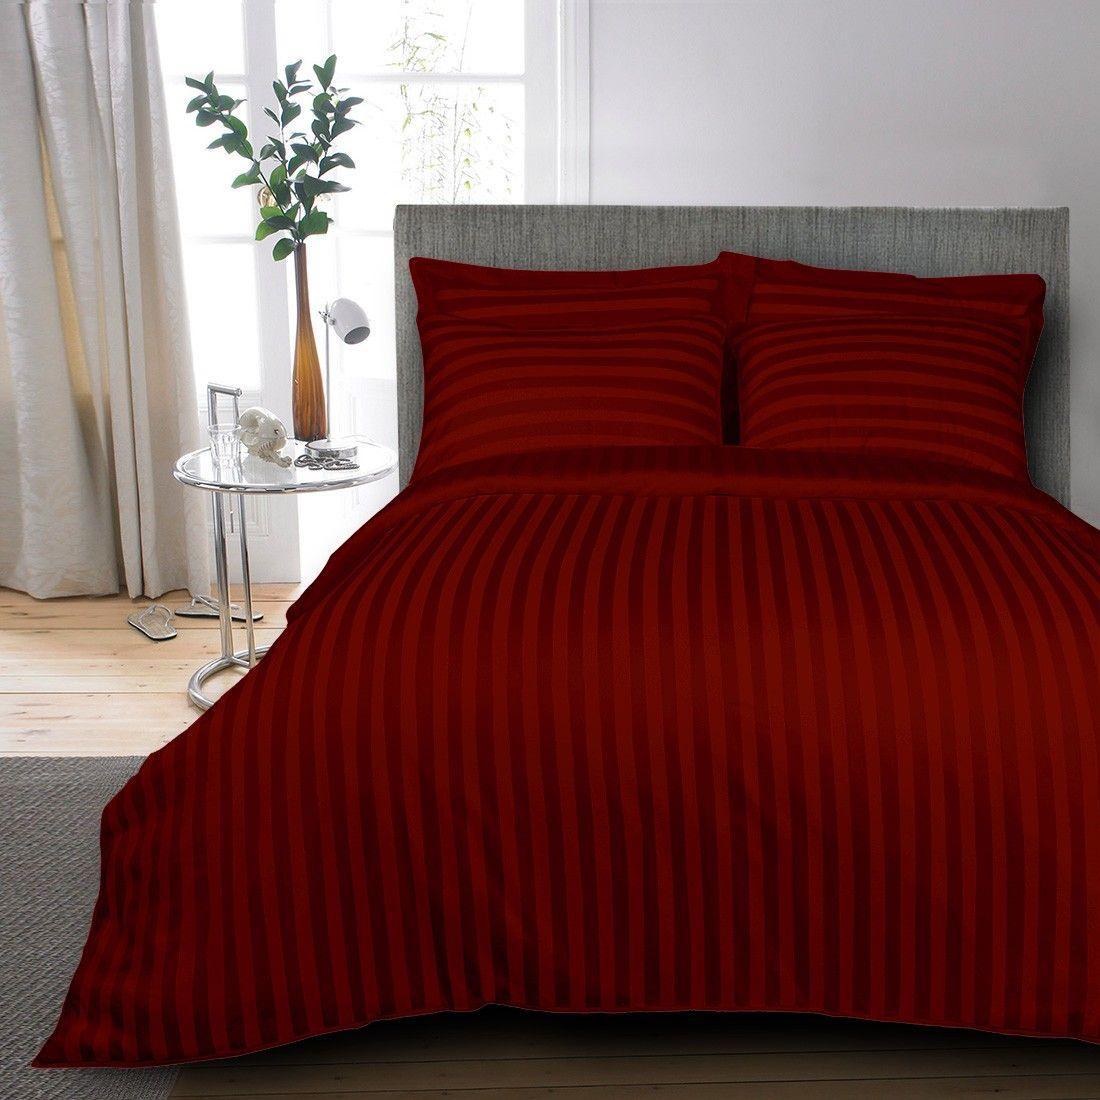 Bed Sheet Designs | Sindhi Ralli Bed Sheets | Buy Sindhi Ralli Bed ...